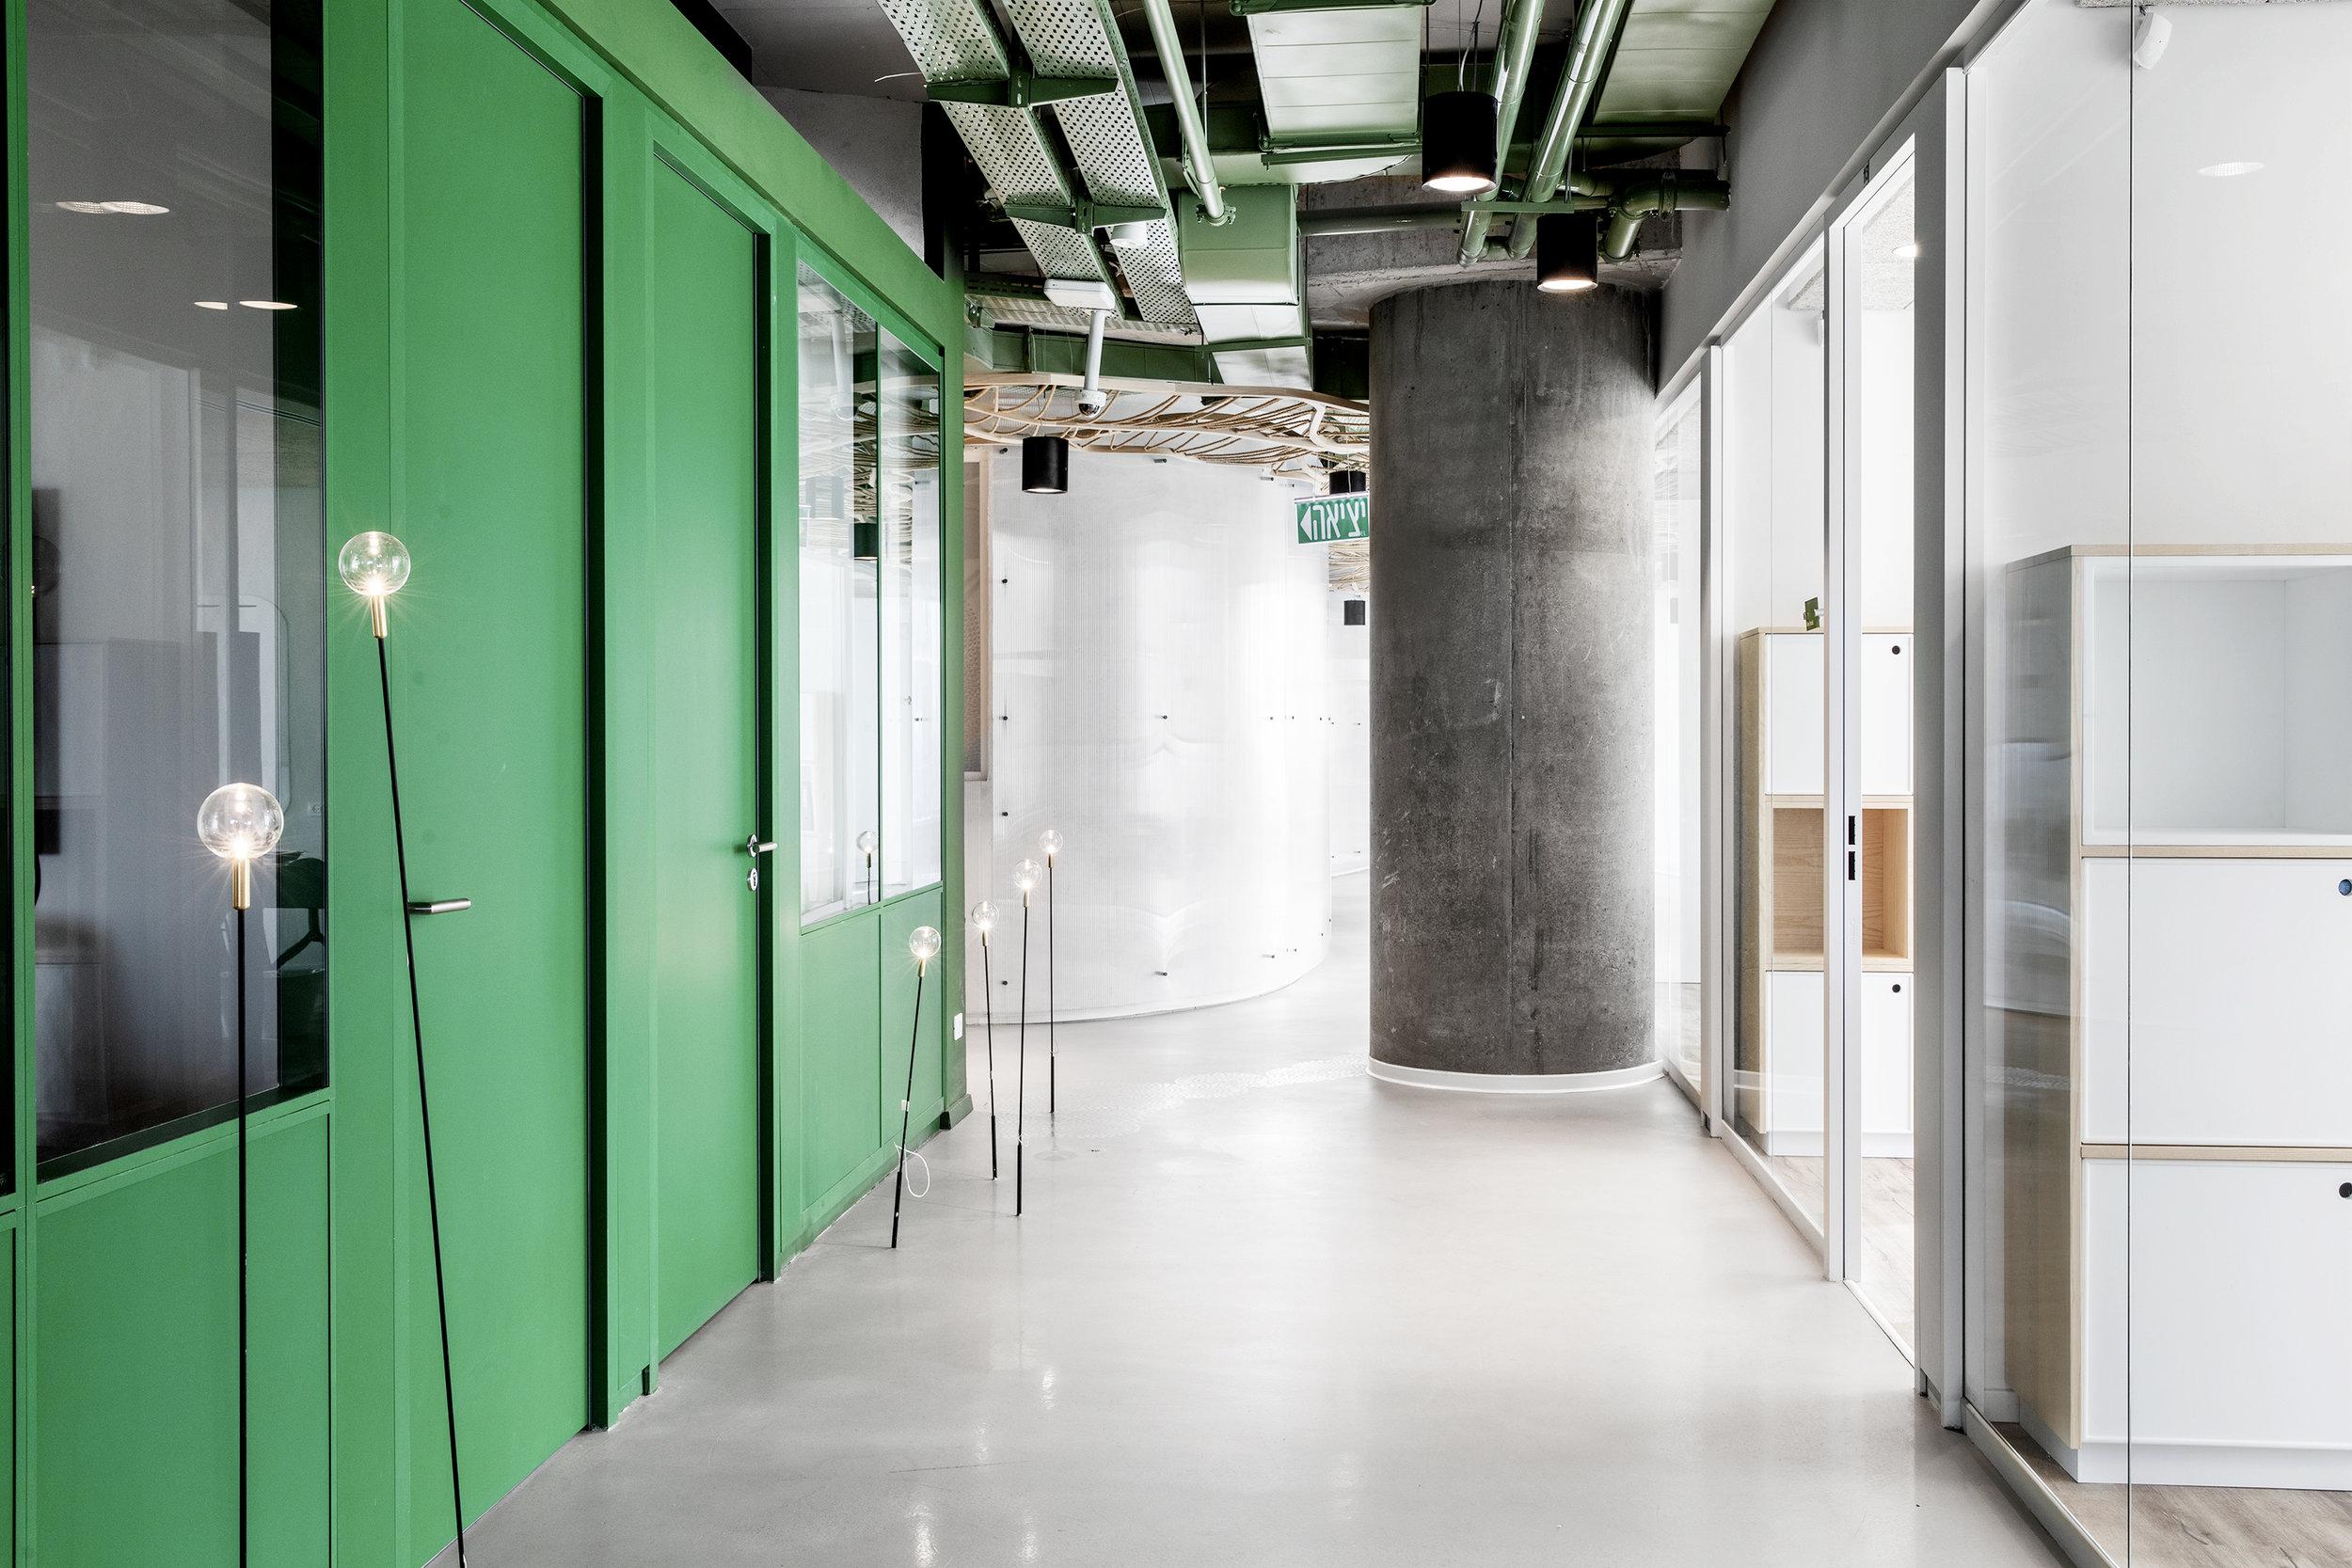 HINNOMAN - ROY DAVID ARCHTECTURE - STUDIO - סטודיו רואי דוד - אדריכלים (17).jpg